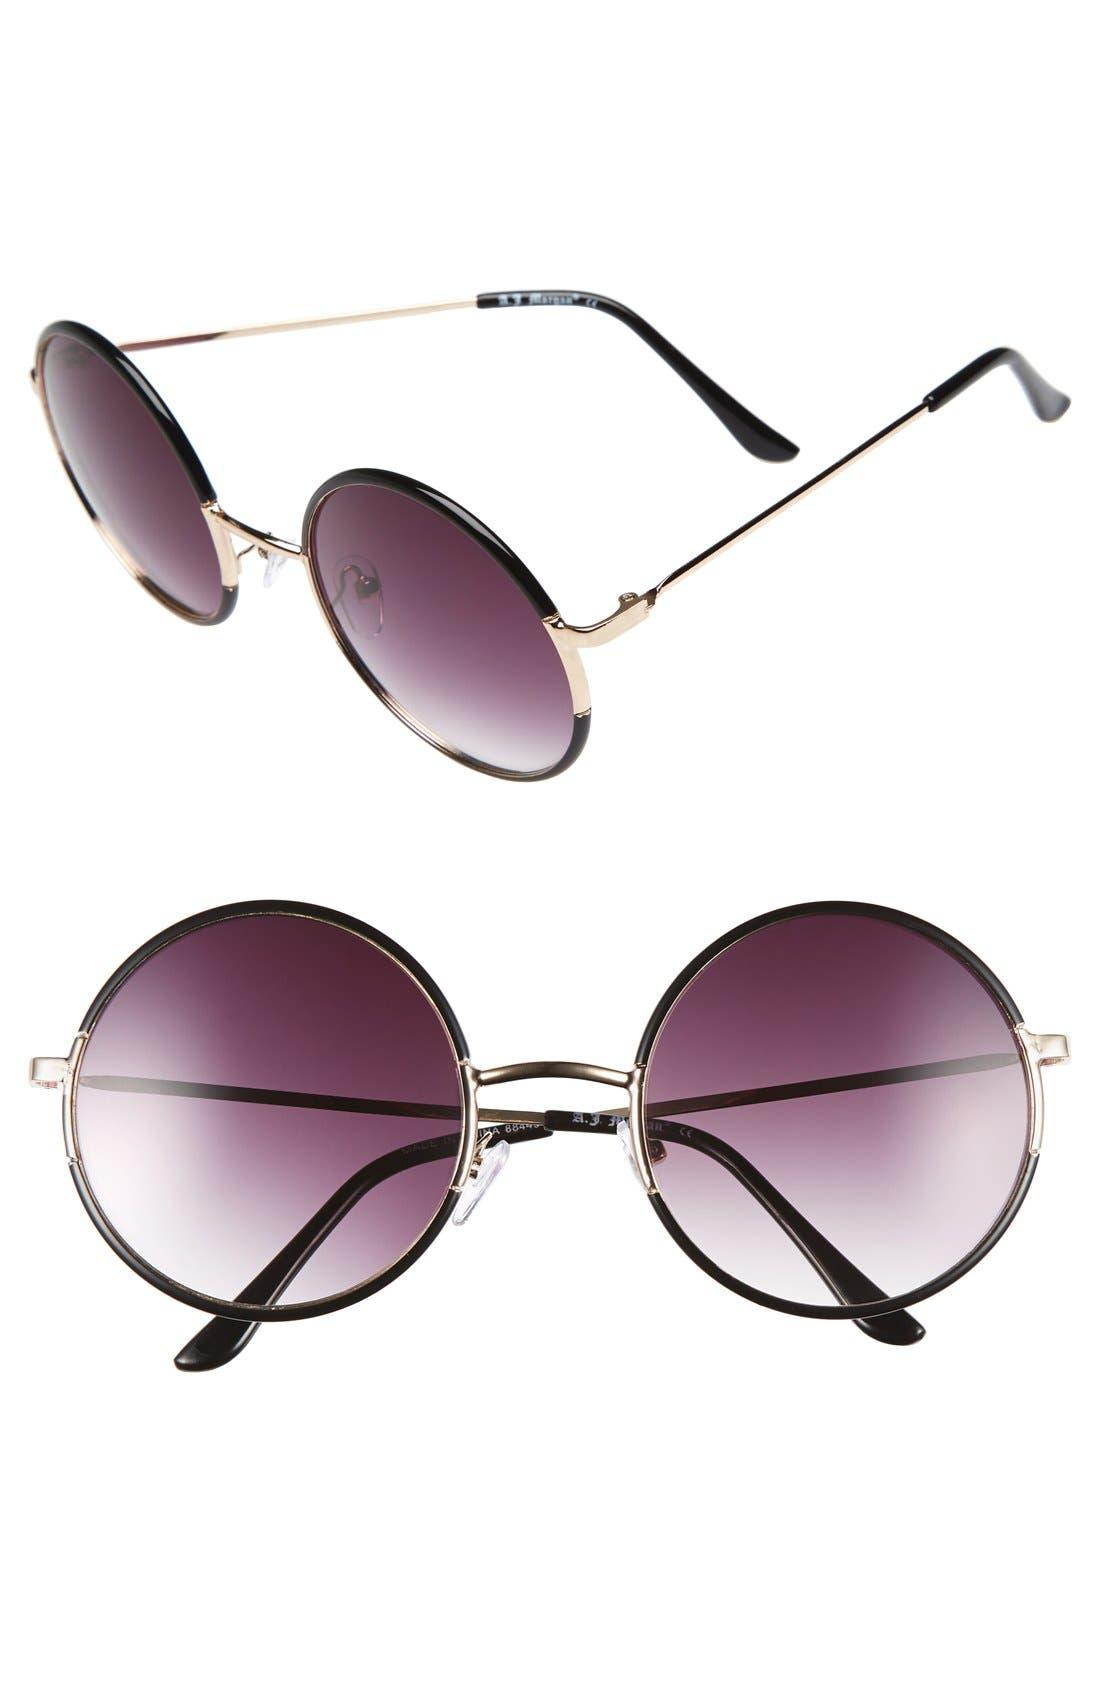 A.J. MORGAN 'Oh Nice' 55mm Round Sunglasses, Main, color, 001